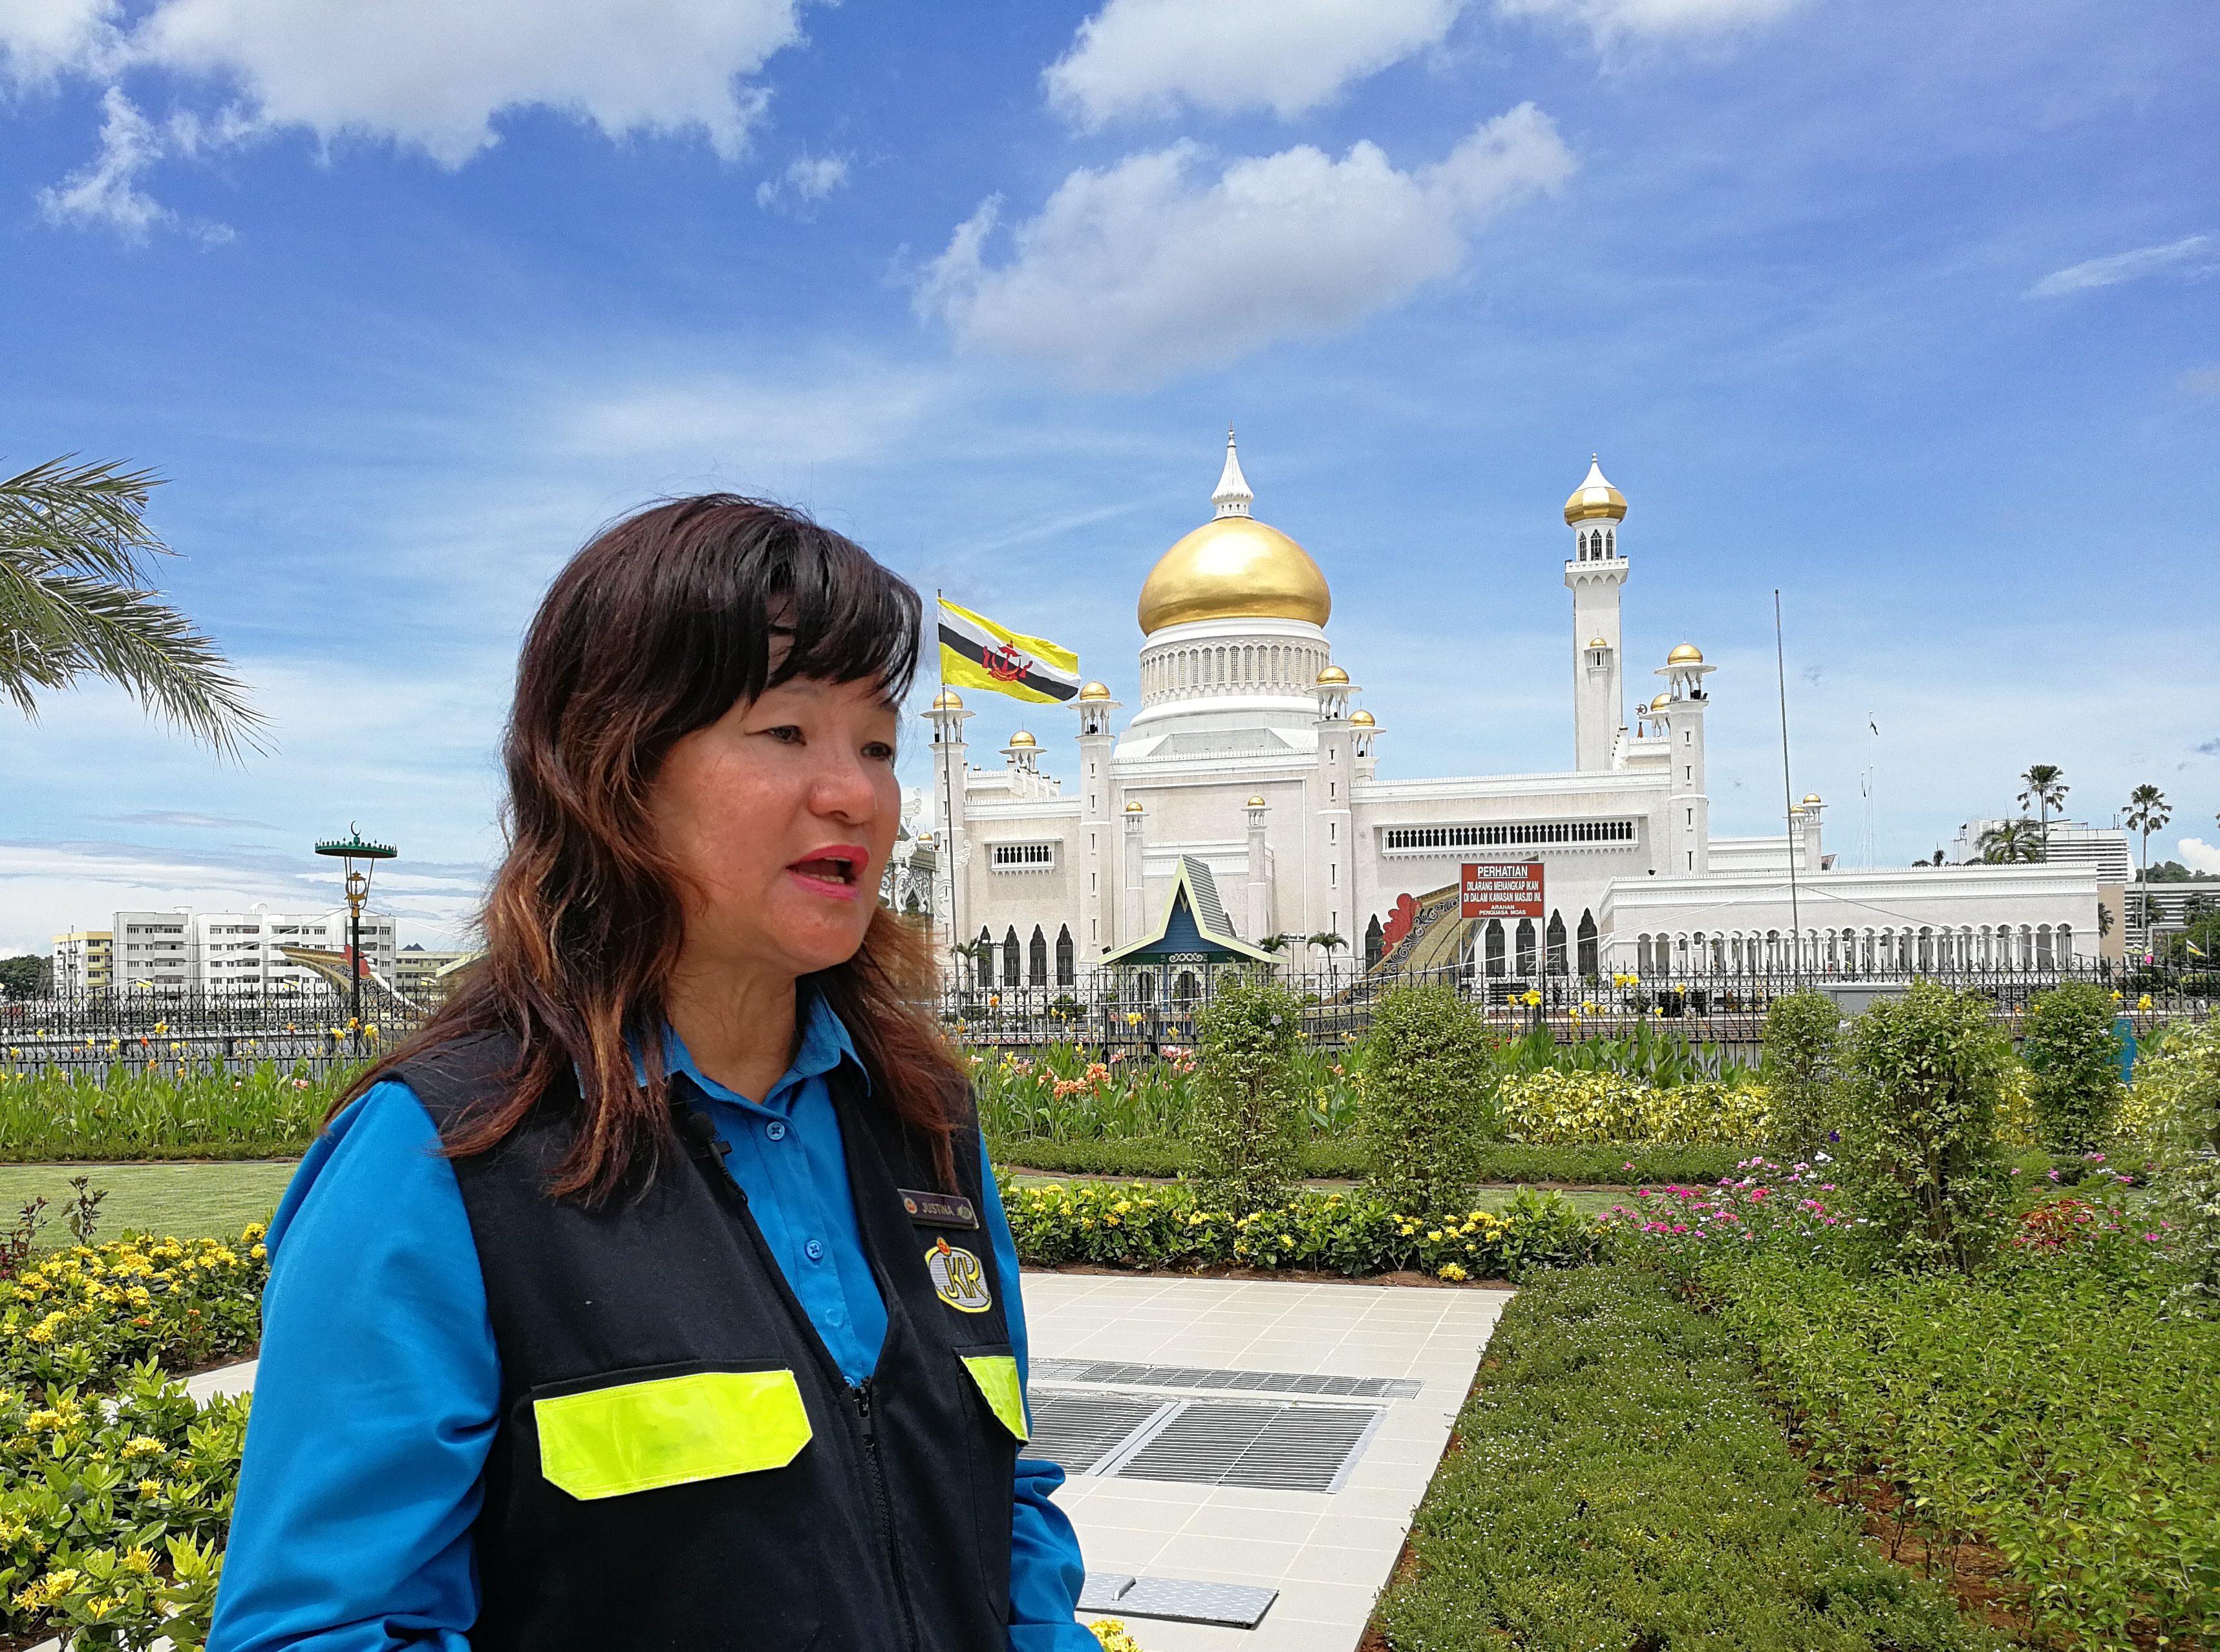 Justina Liew Vun Ching, acting director of Drainage and Sewerage. Photo: Ubaidillah Masli/The Scoop